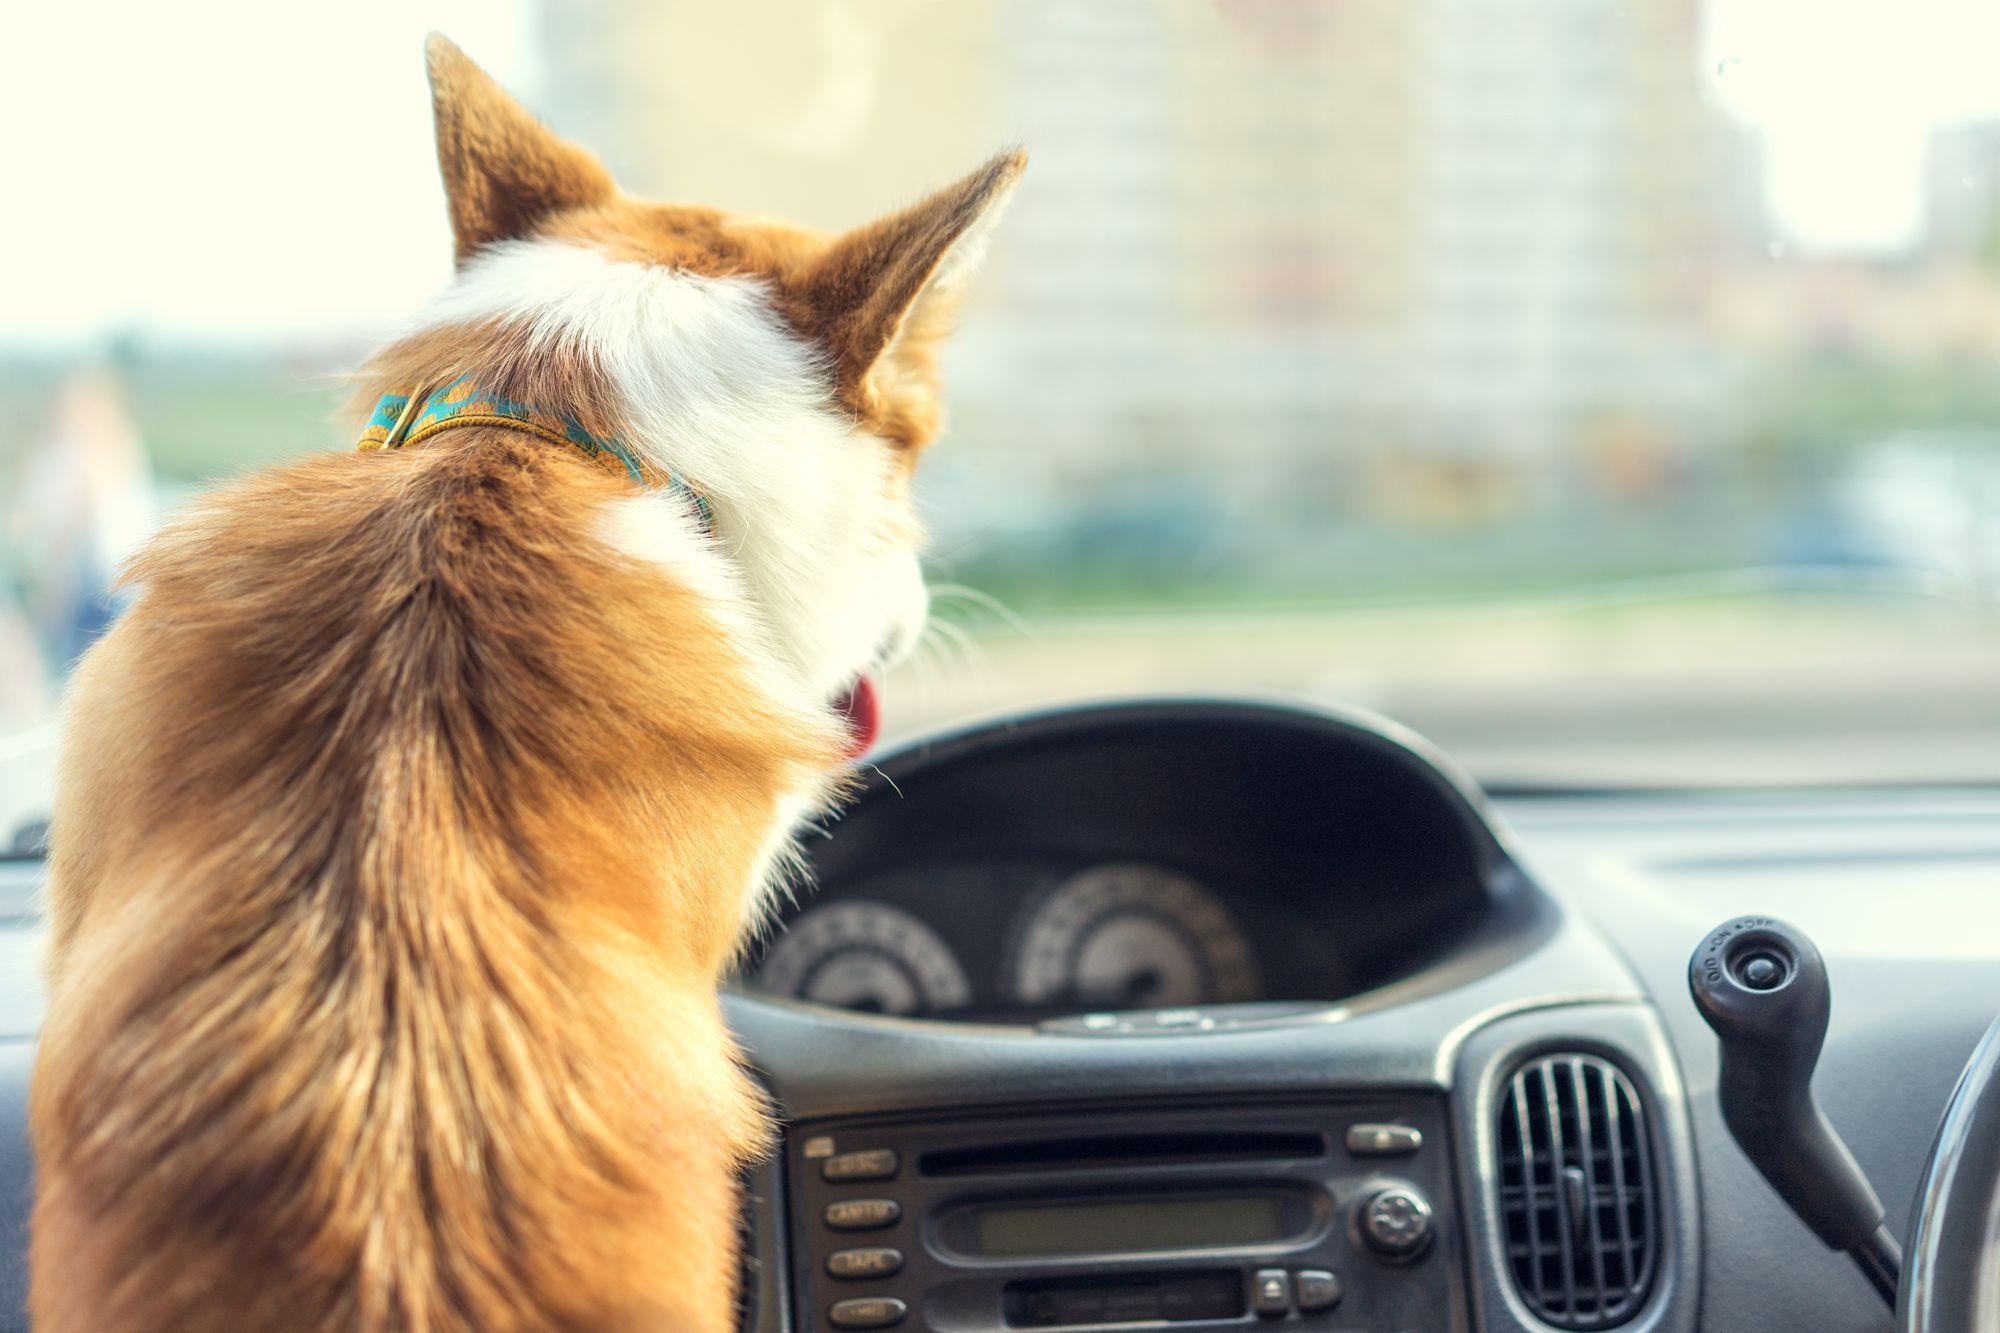 Corgi driving a car.